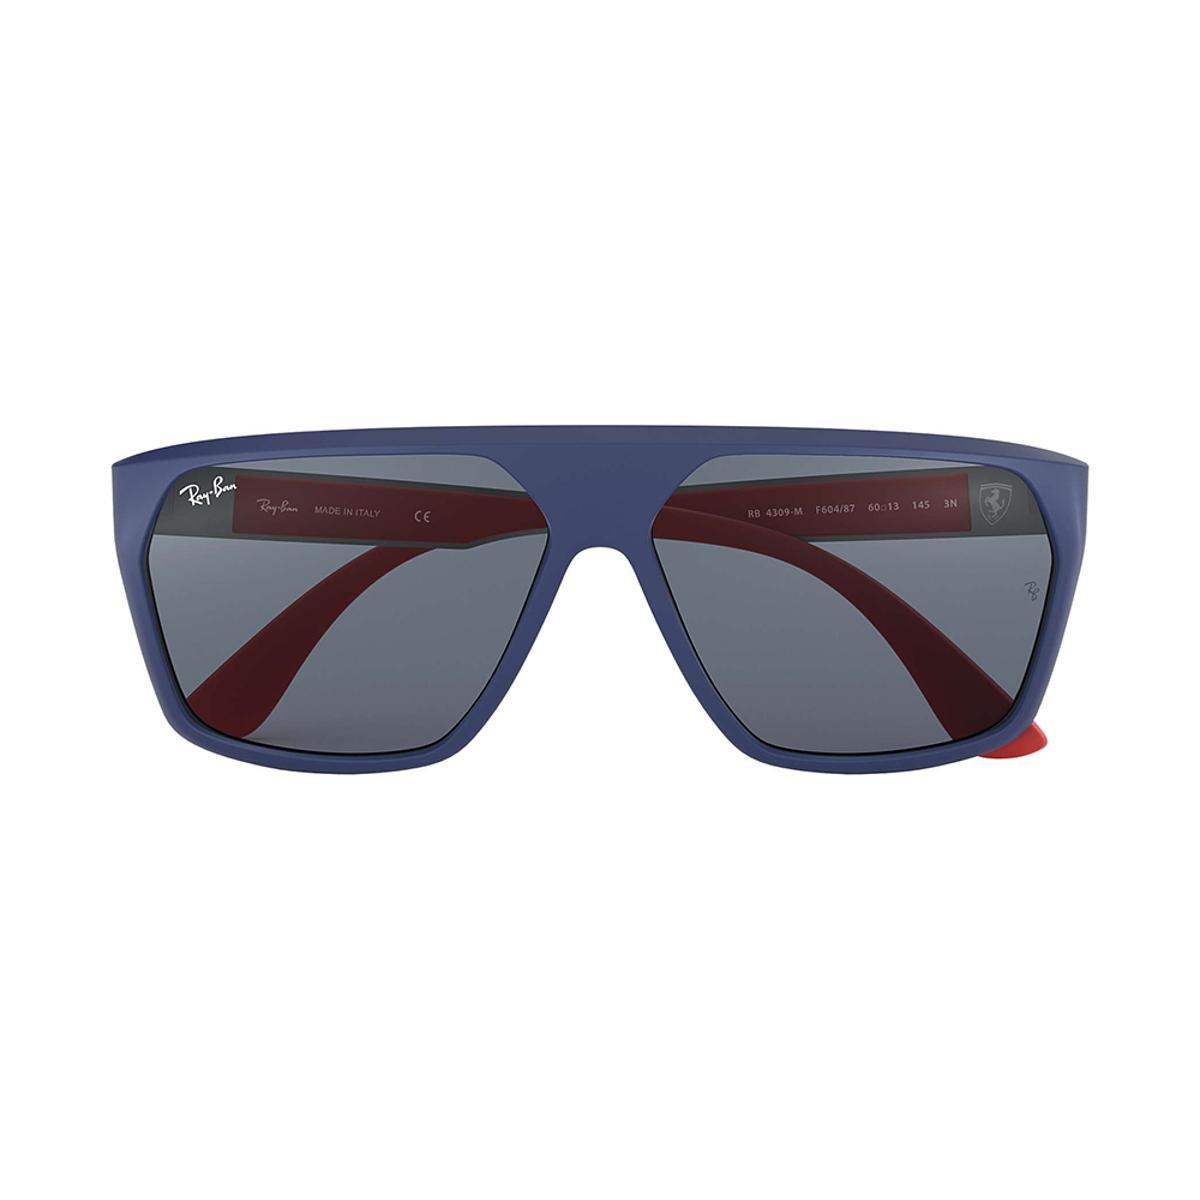 Óculos de Sol Ray-Ban RB4309M Masculino - Compre Agora   Zattini 21398bd32e